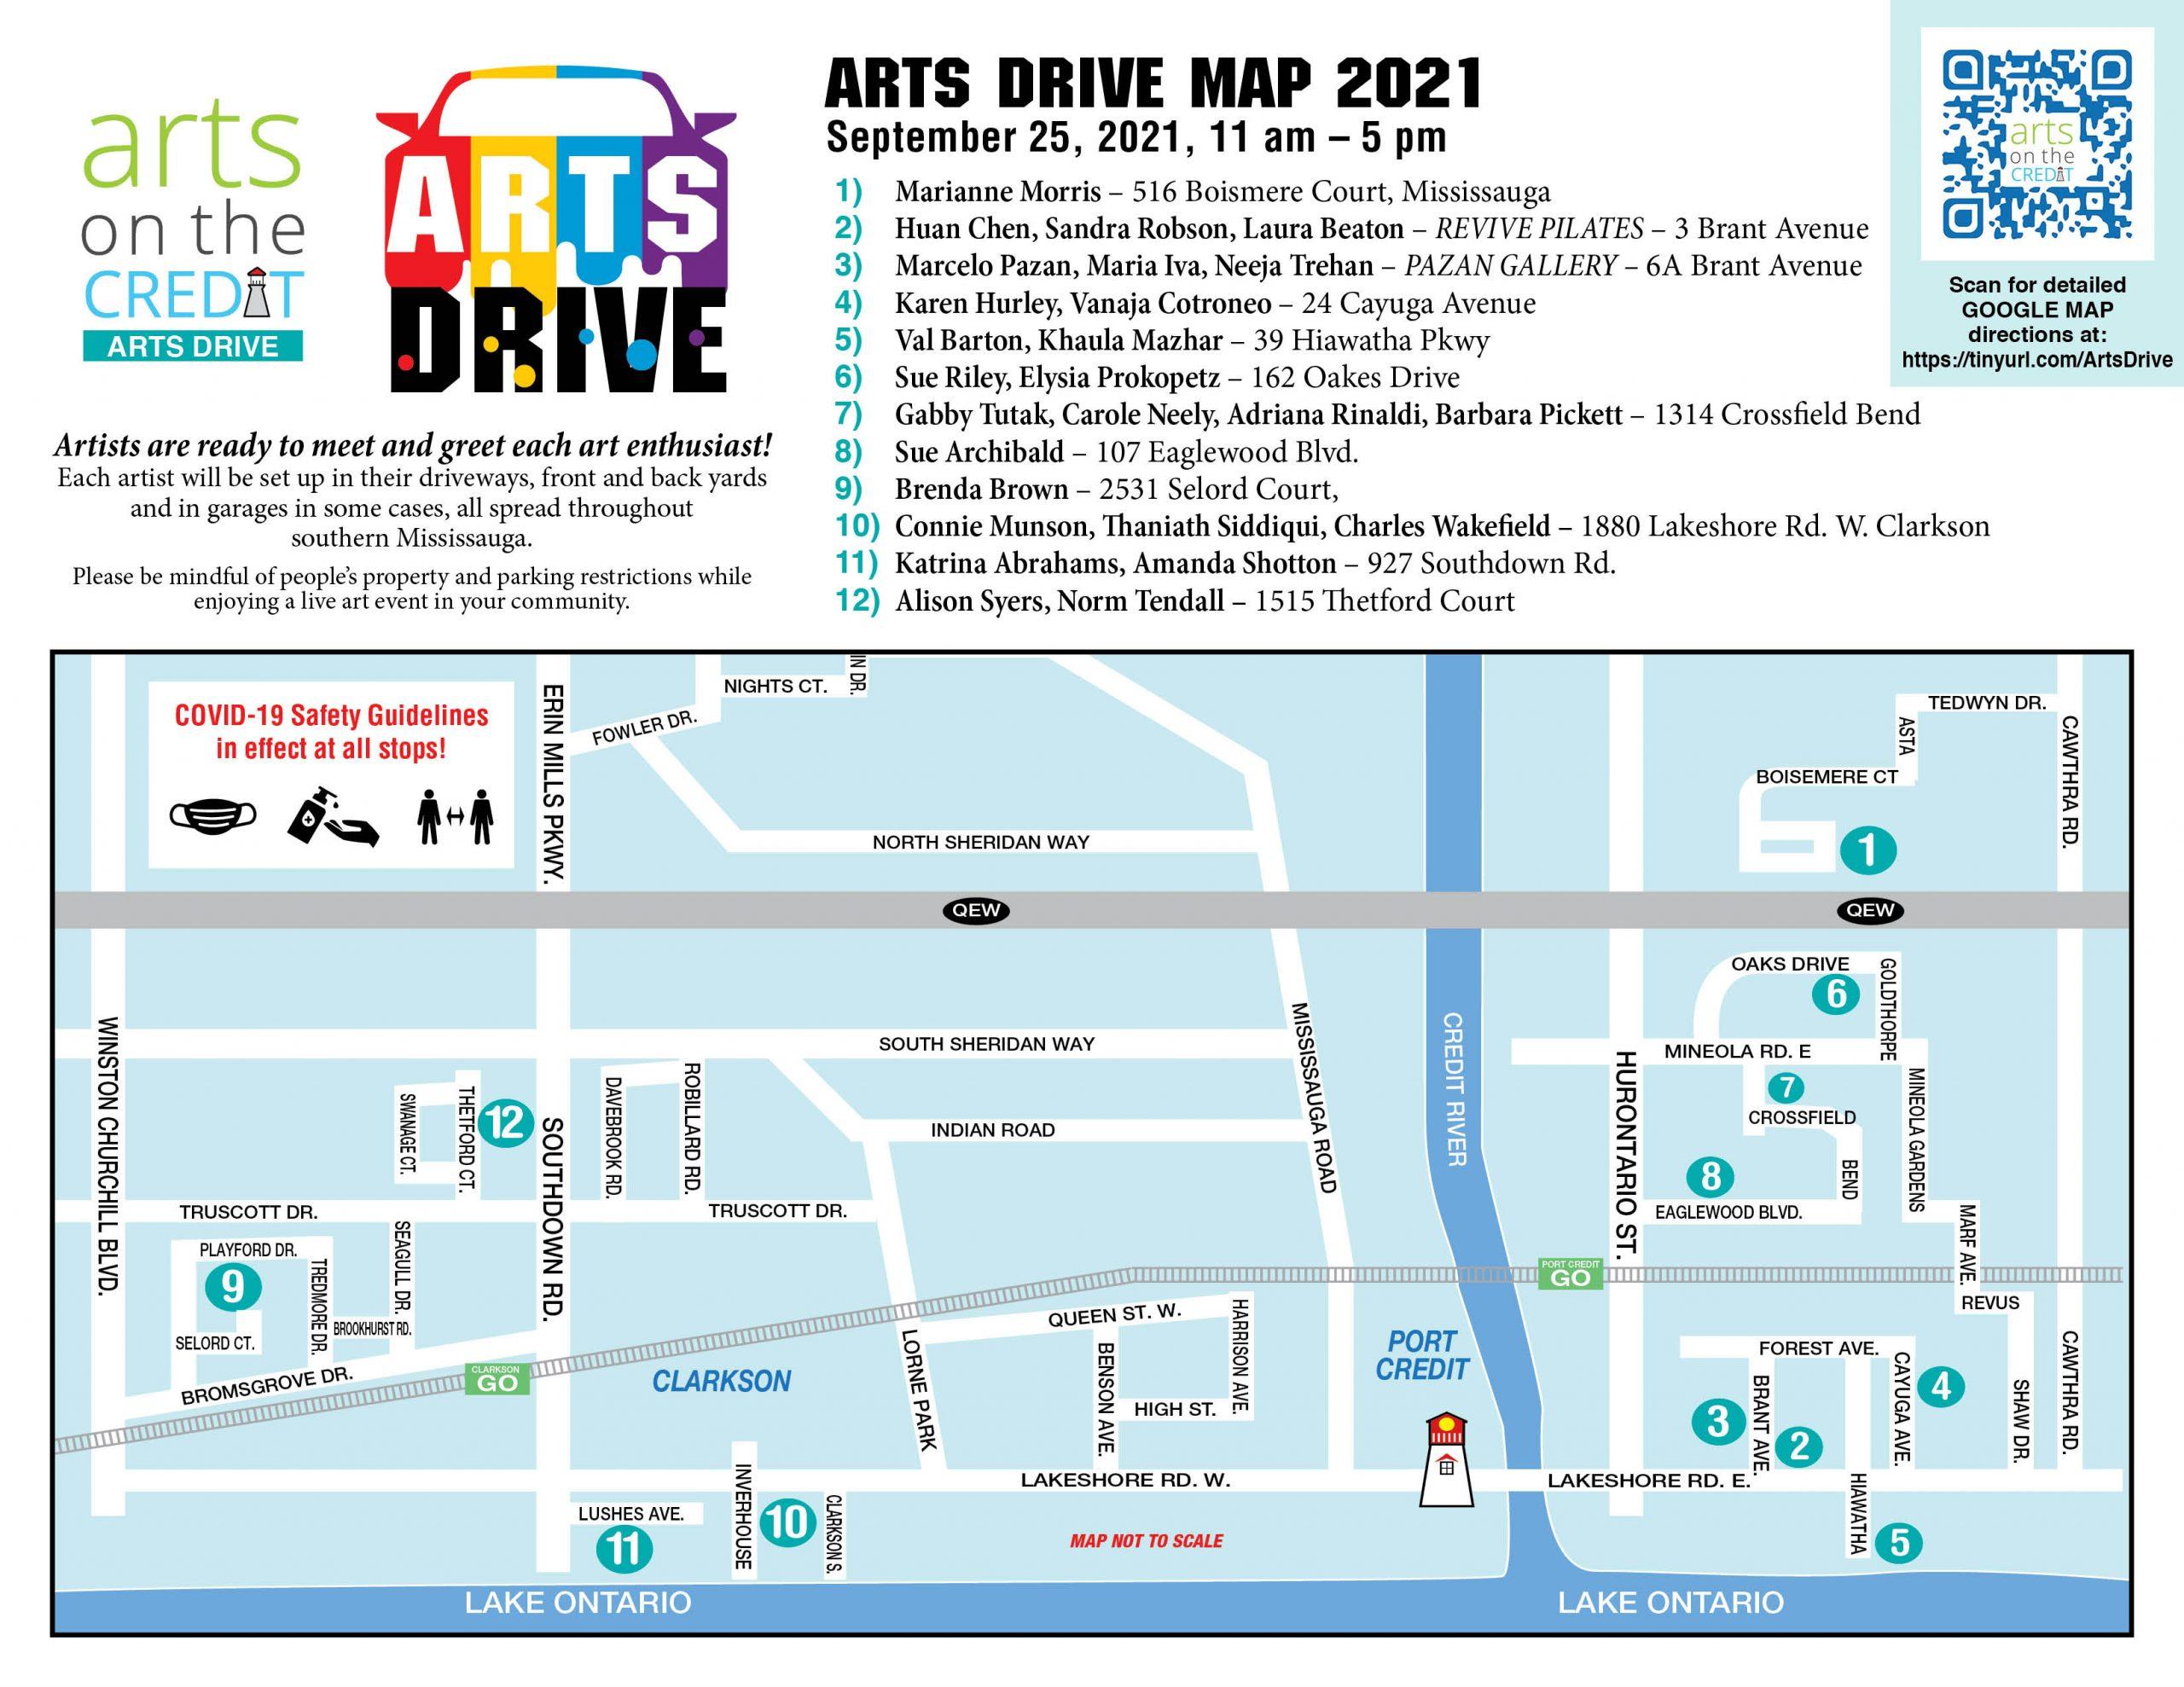 Downloadable_Arts_Drive_2021_Map